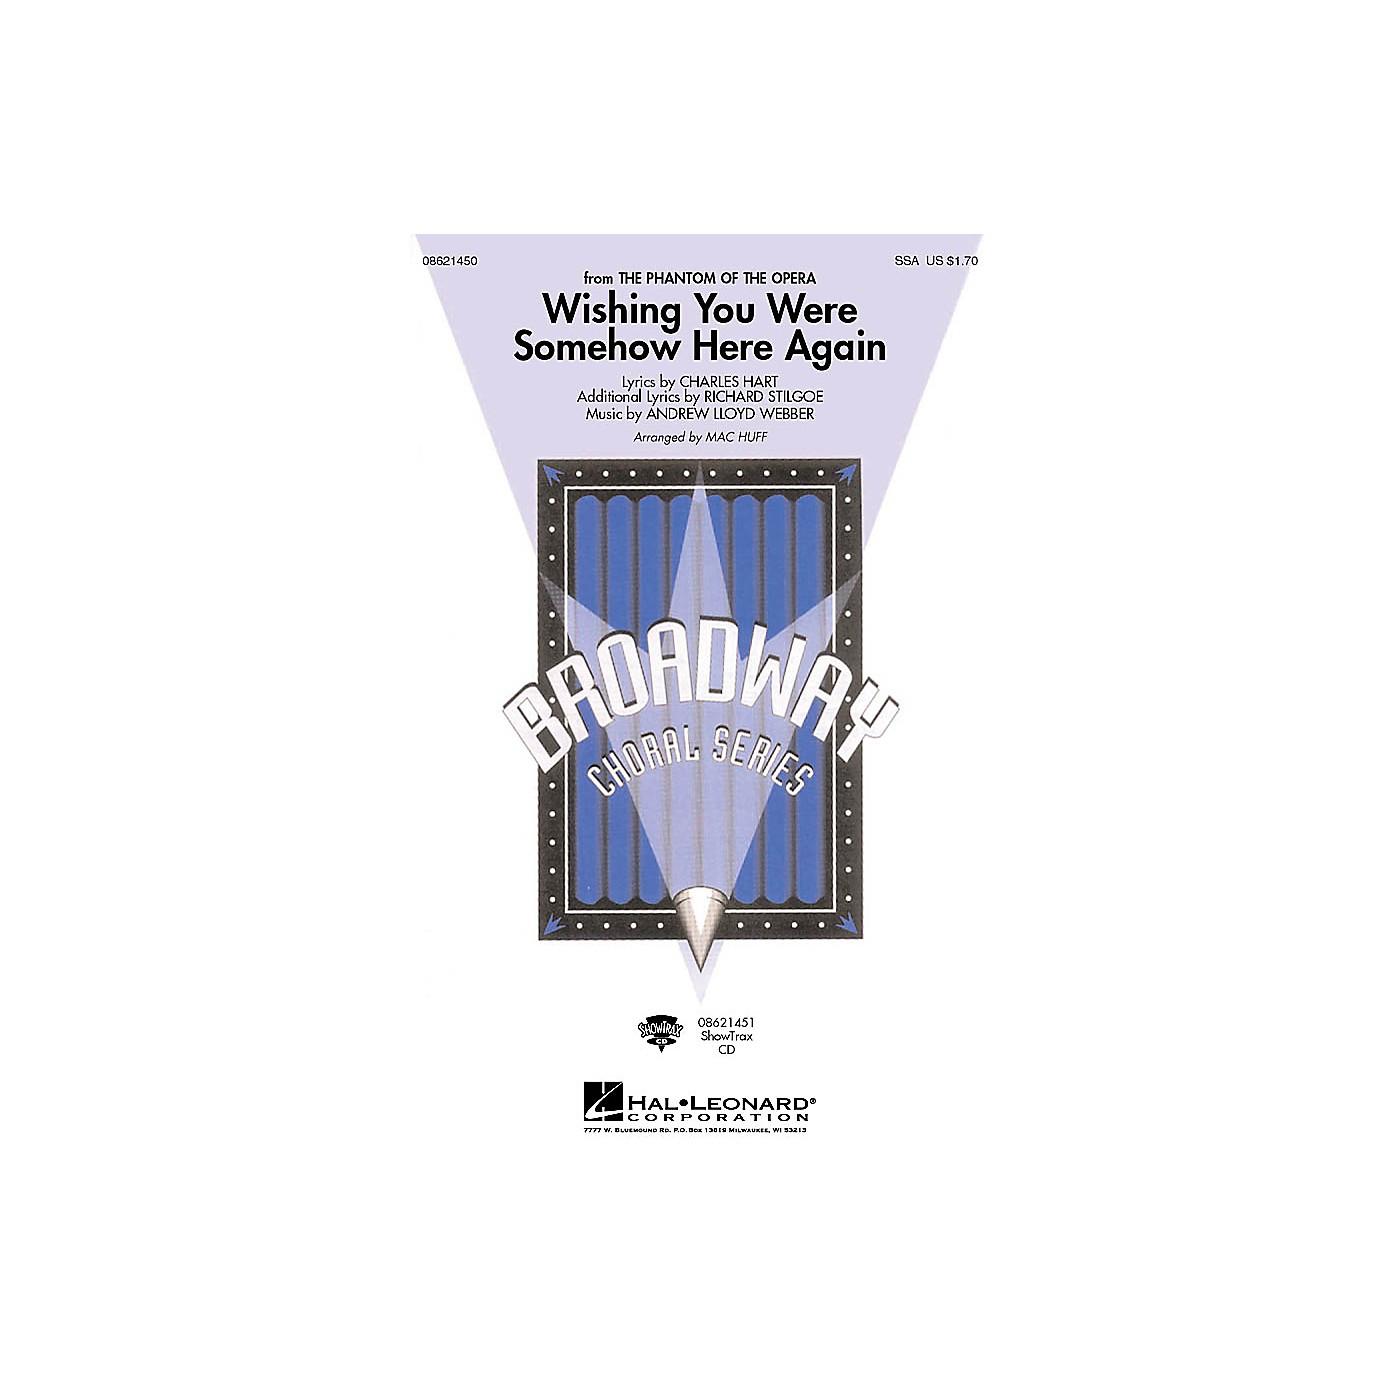 Hal Leonard Wishing You Were Somehow Here Again ShowTrax CD Arranged by Mac Huff thumbnail